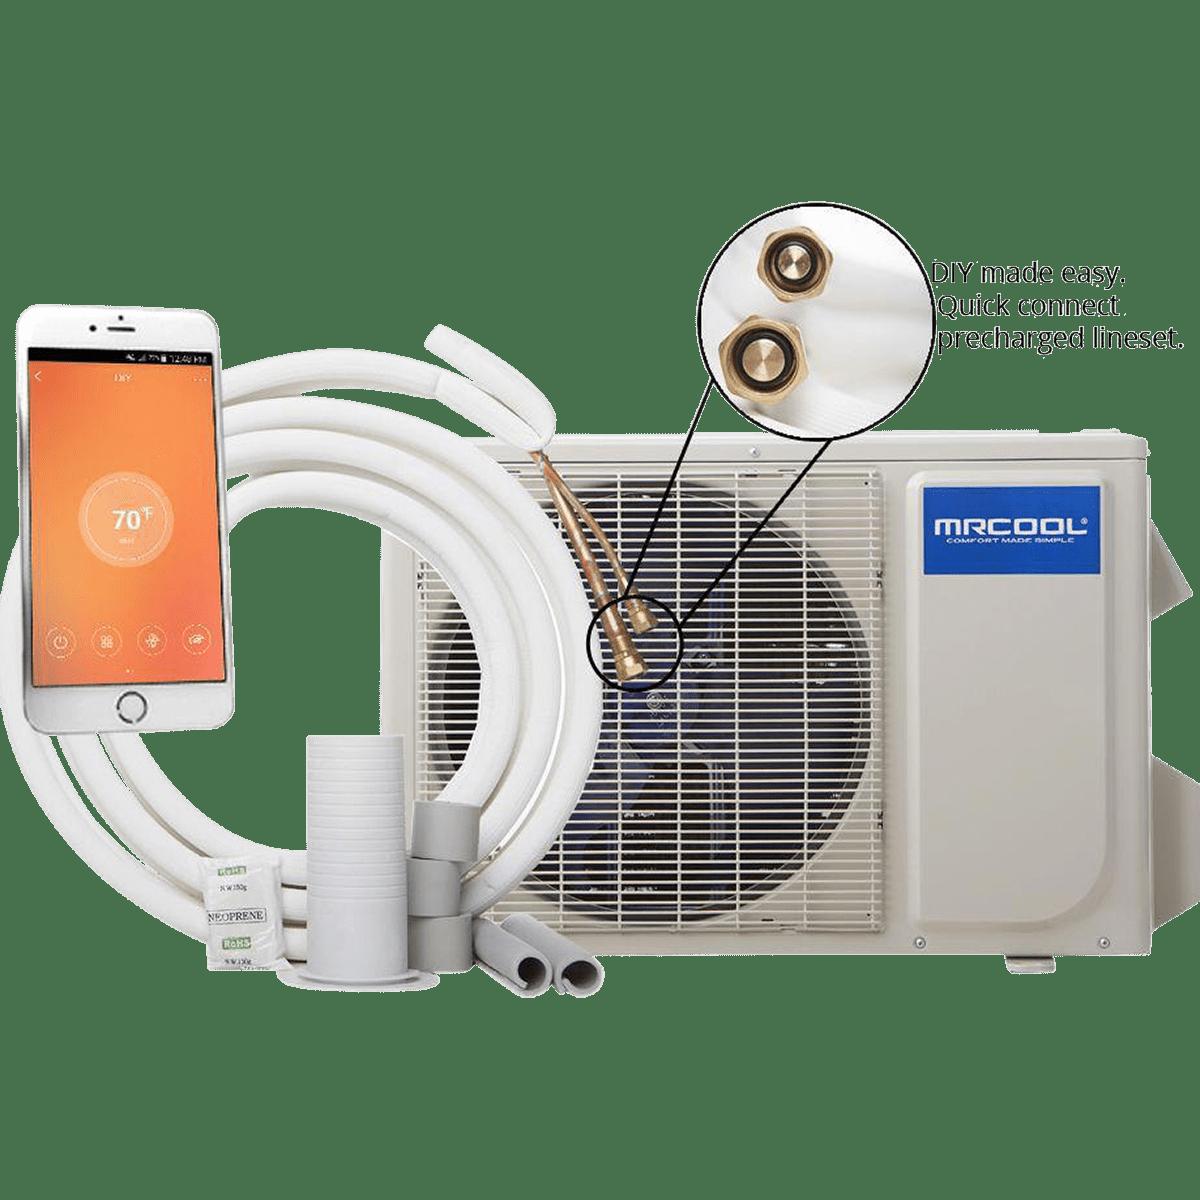 Mrcool Diy 24000 Btu 230v Mini Split Heat Pump Sylvane Weather King Air Conditioner Wiring Diagram